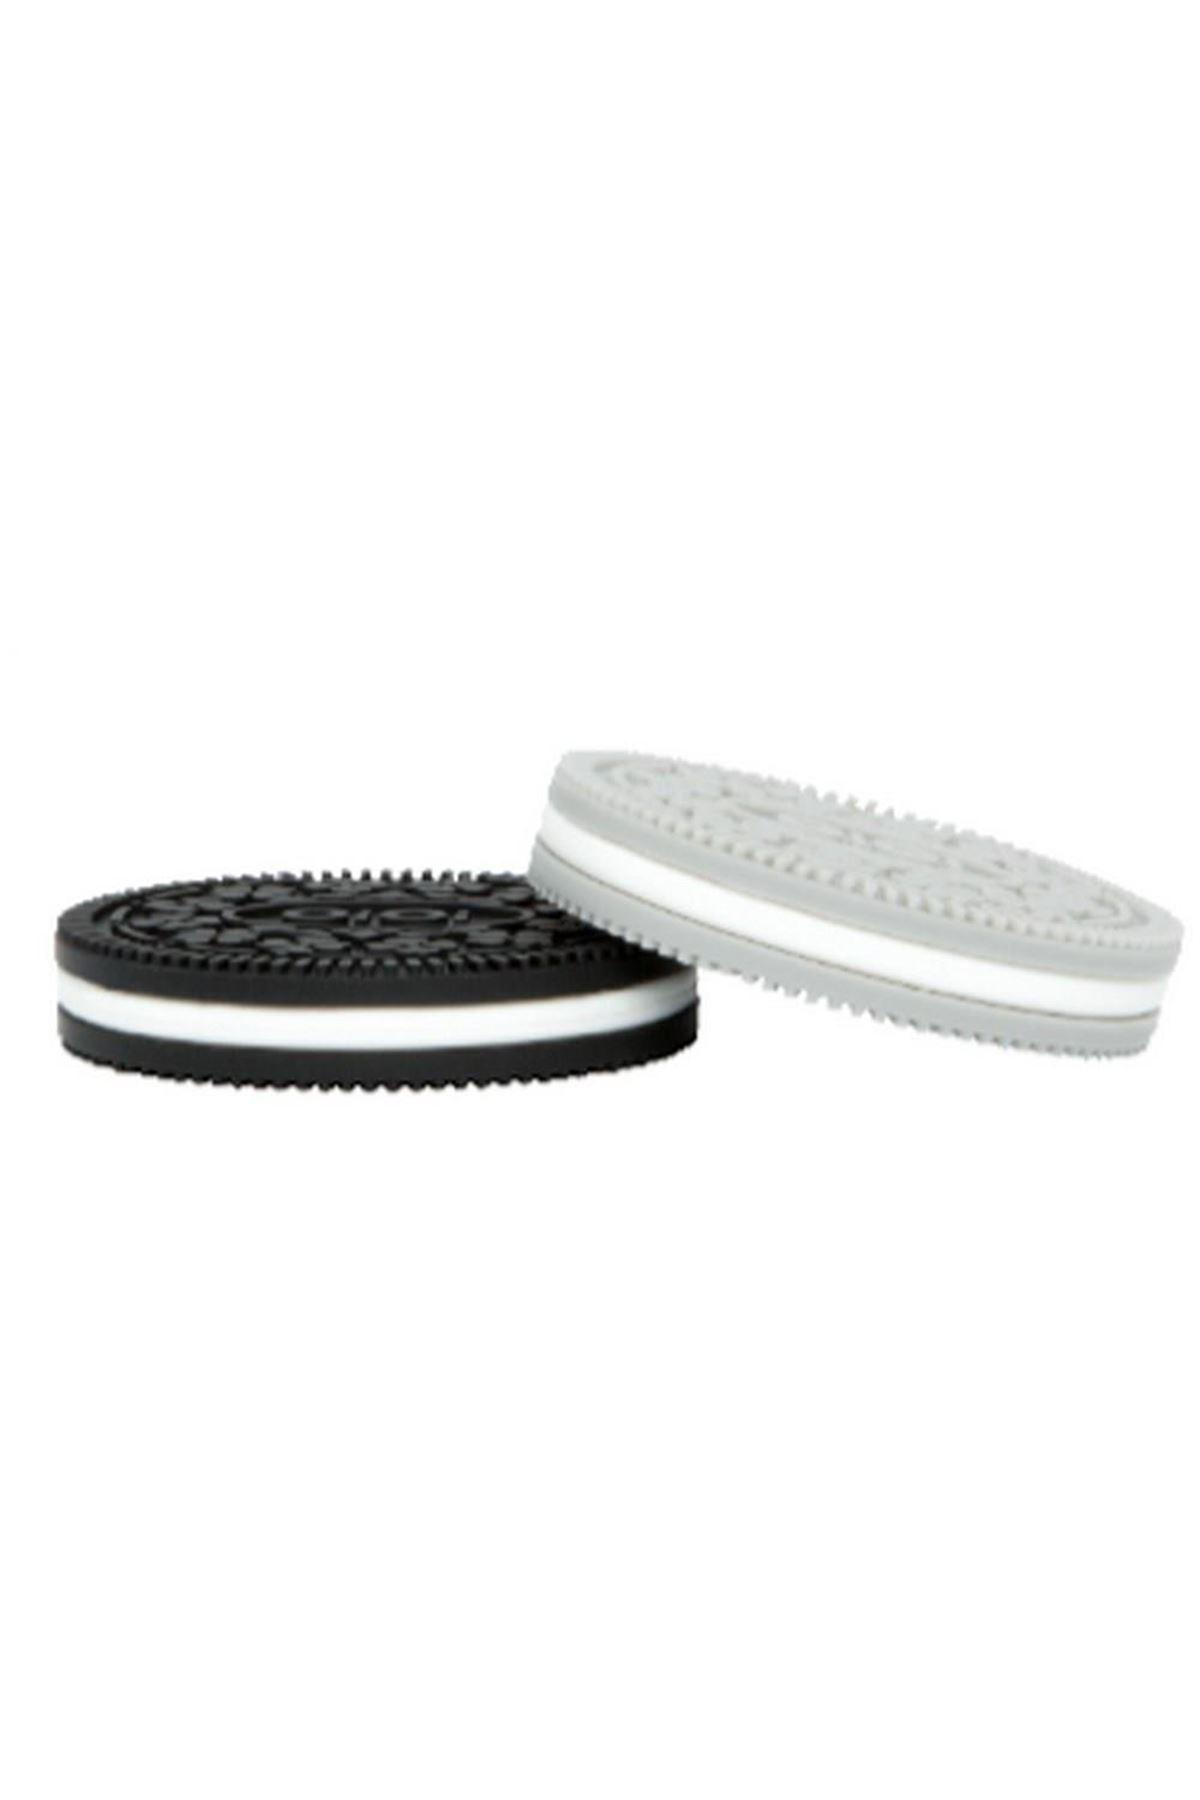 OiOi Kuki Diş Kaşıyıcı 2li Siyah Gri